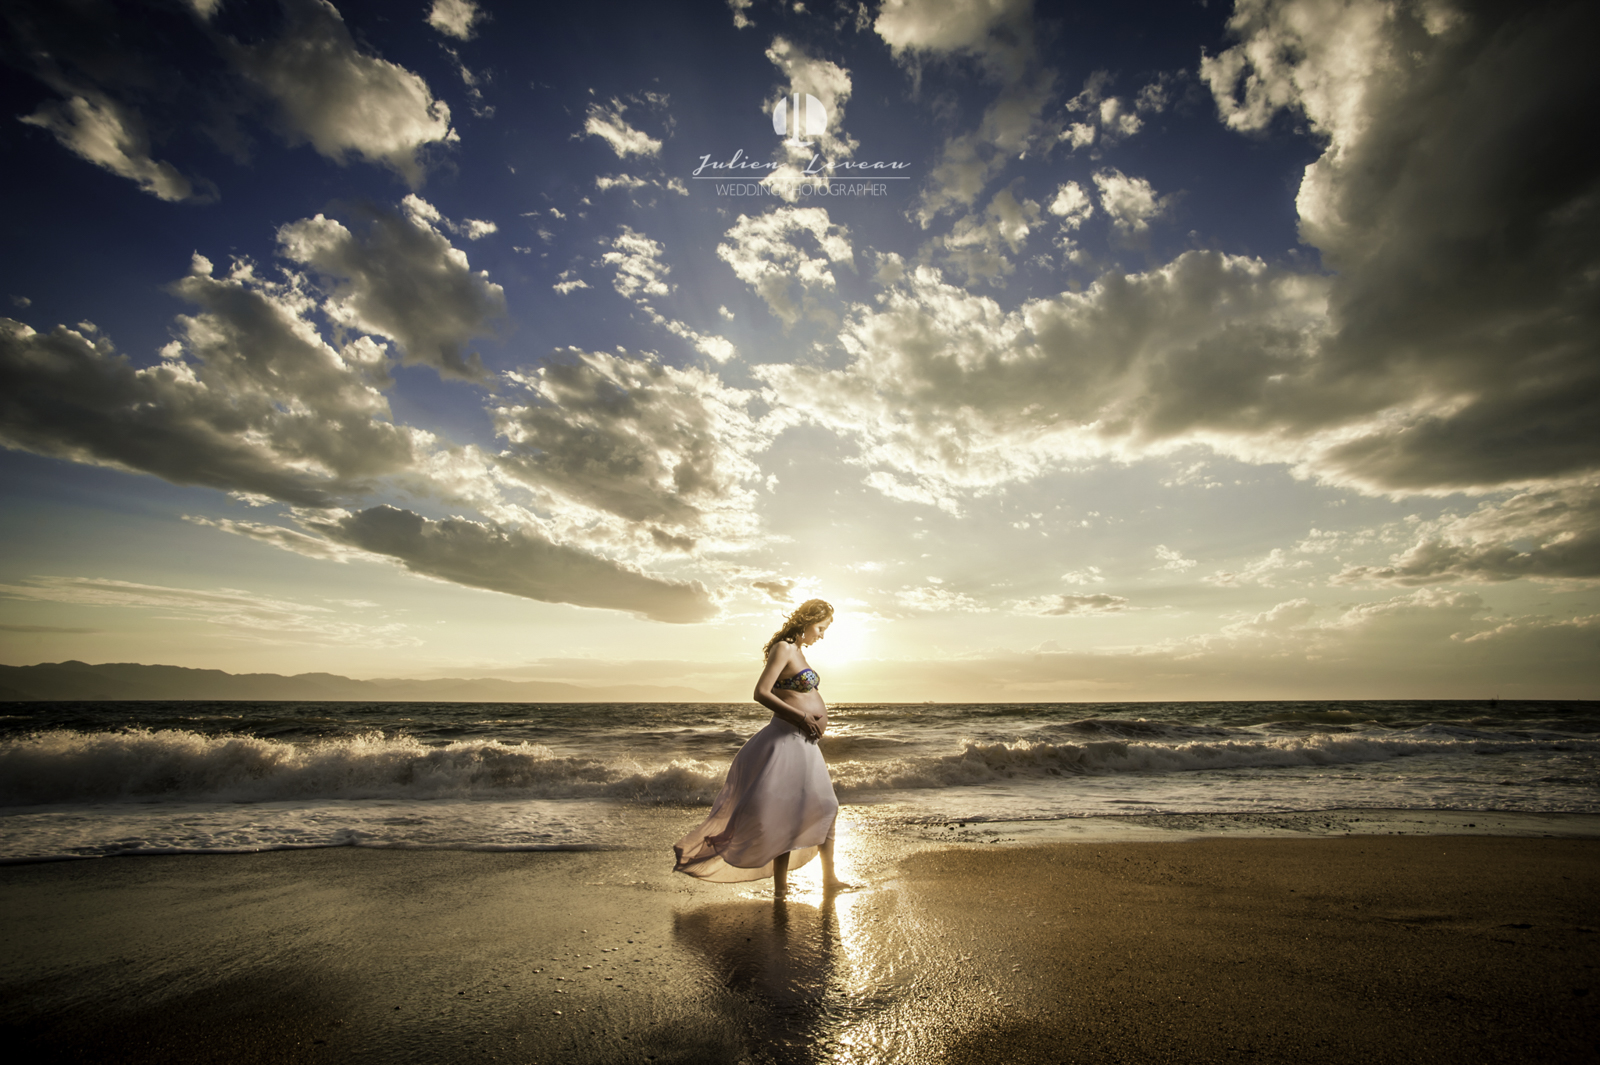 Pregnancy photo shooting on the beach in Puerto Vallarta